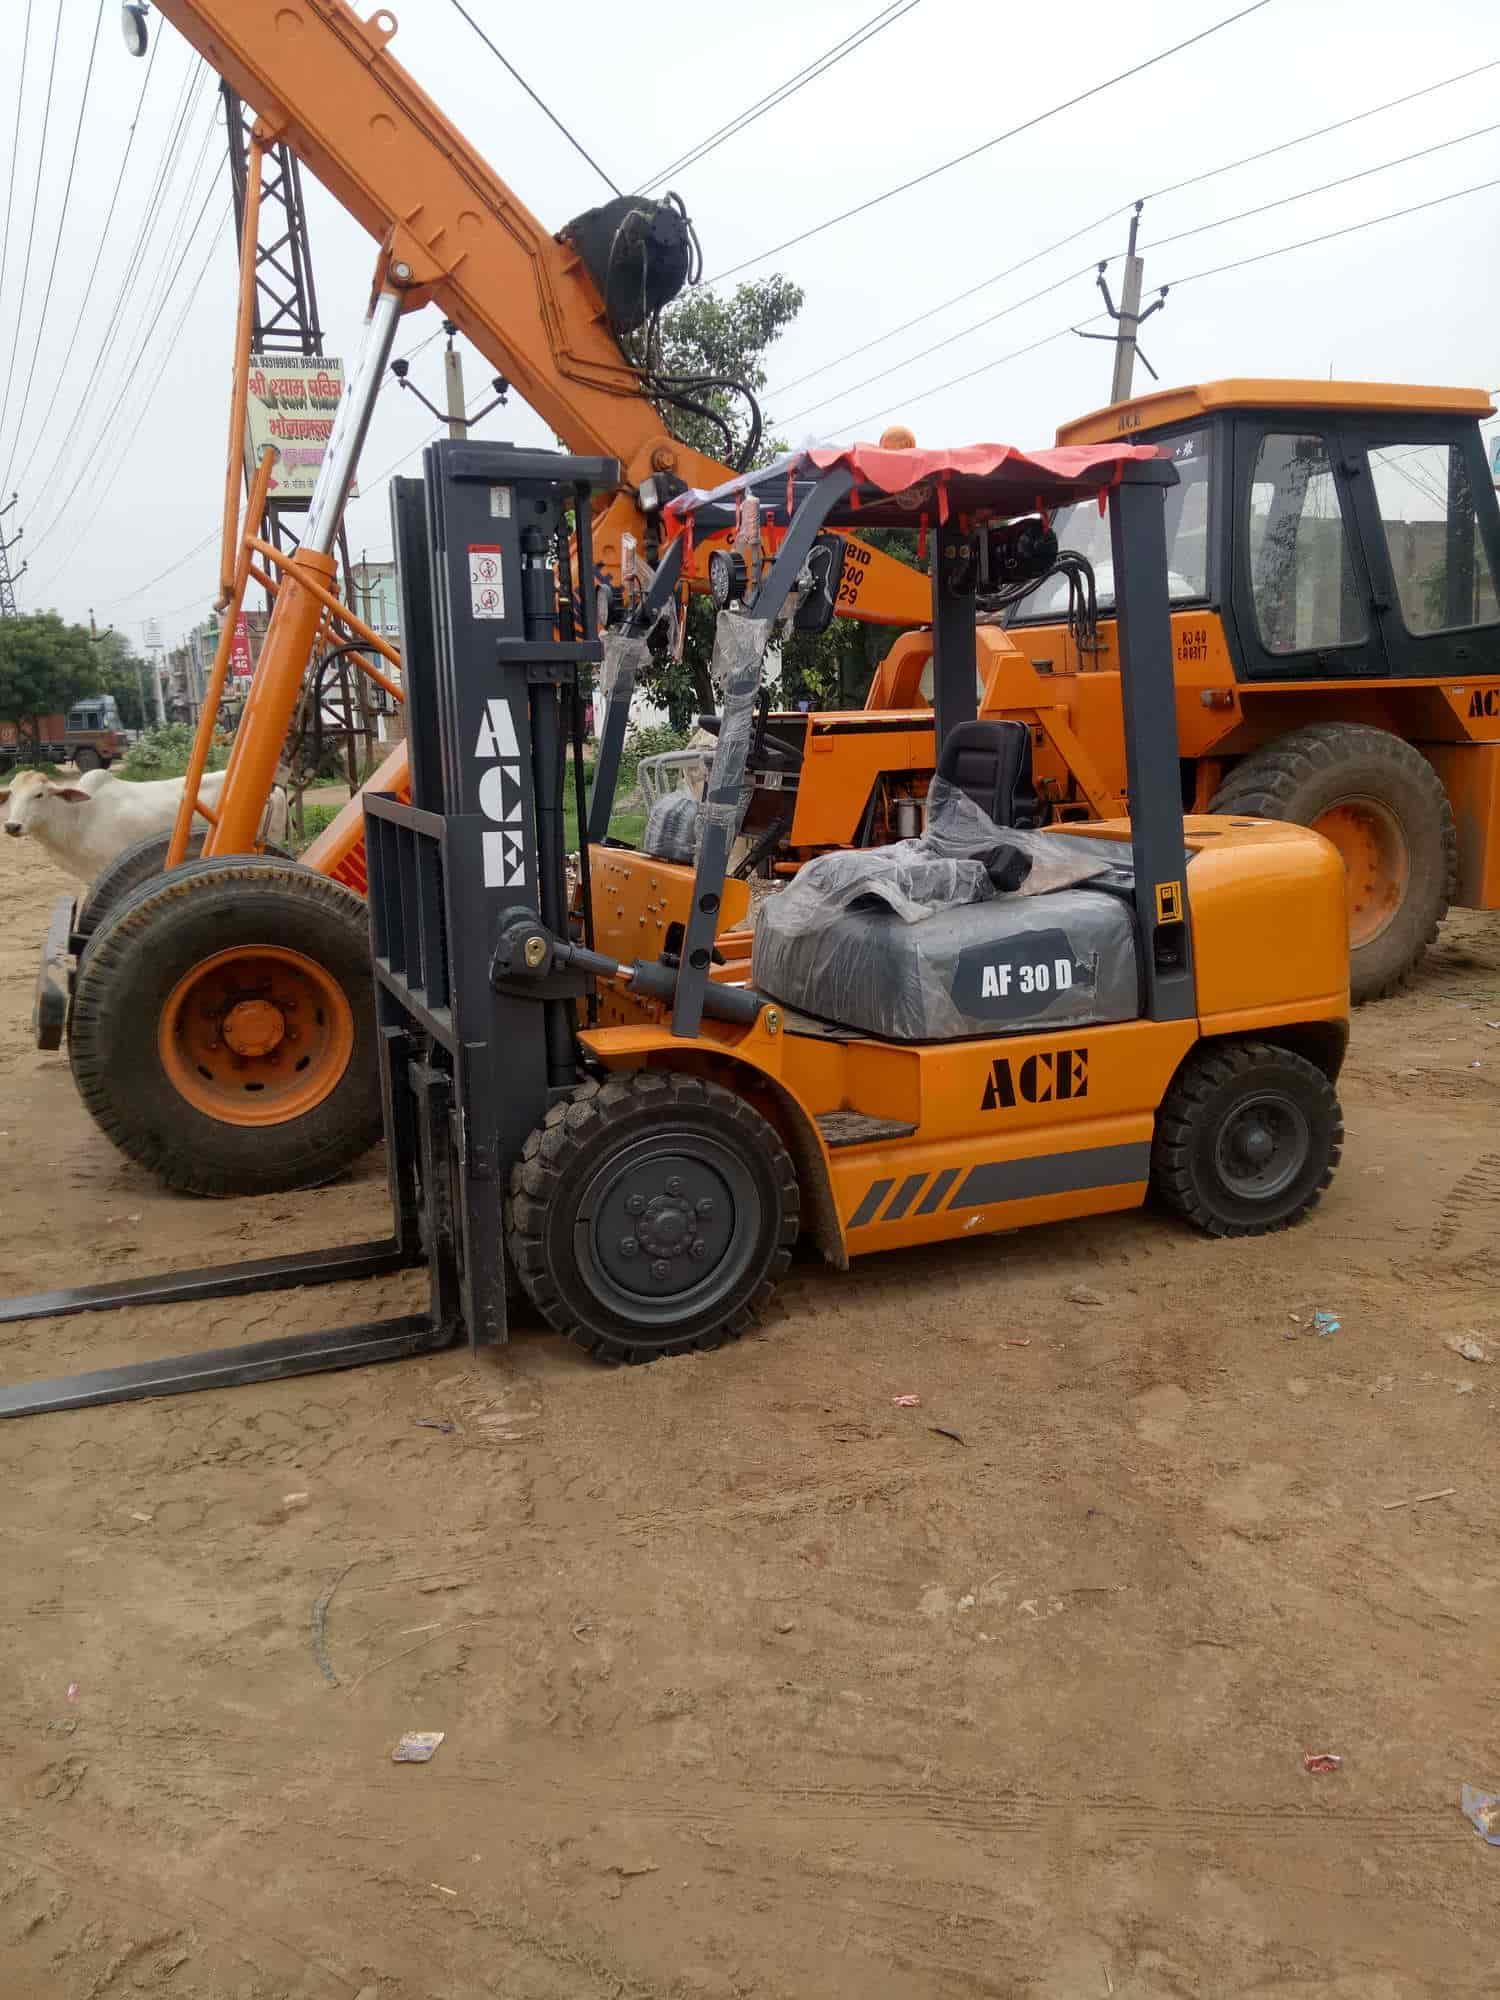 Crane on Hire - Khurshid Crane Service Photos, Chopanki, Bhiwadi - Cranes On Hire ...